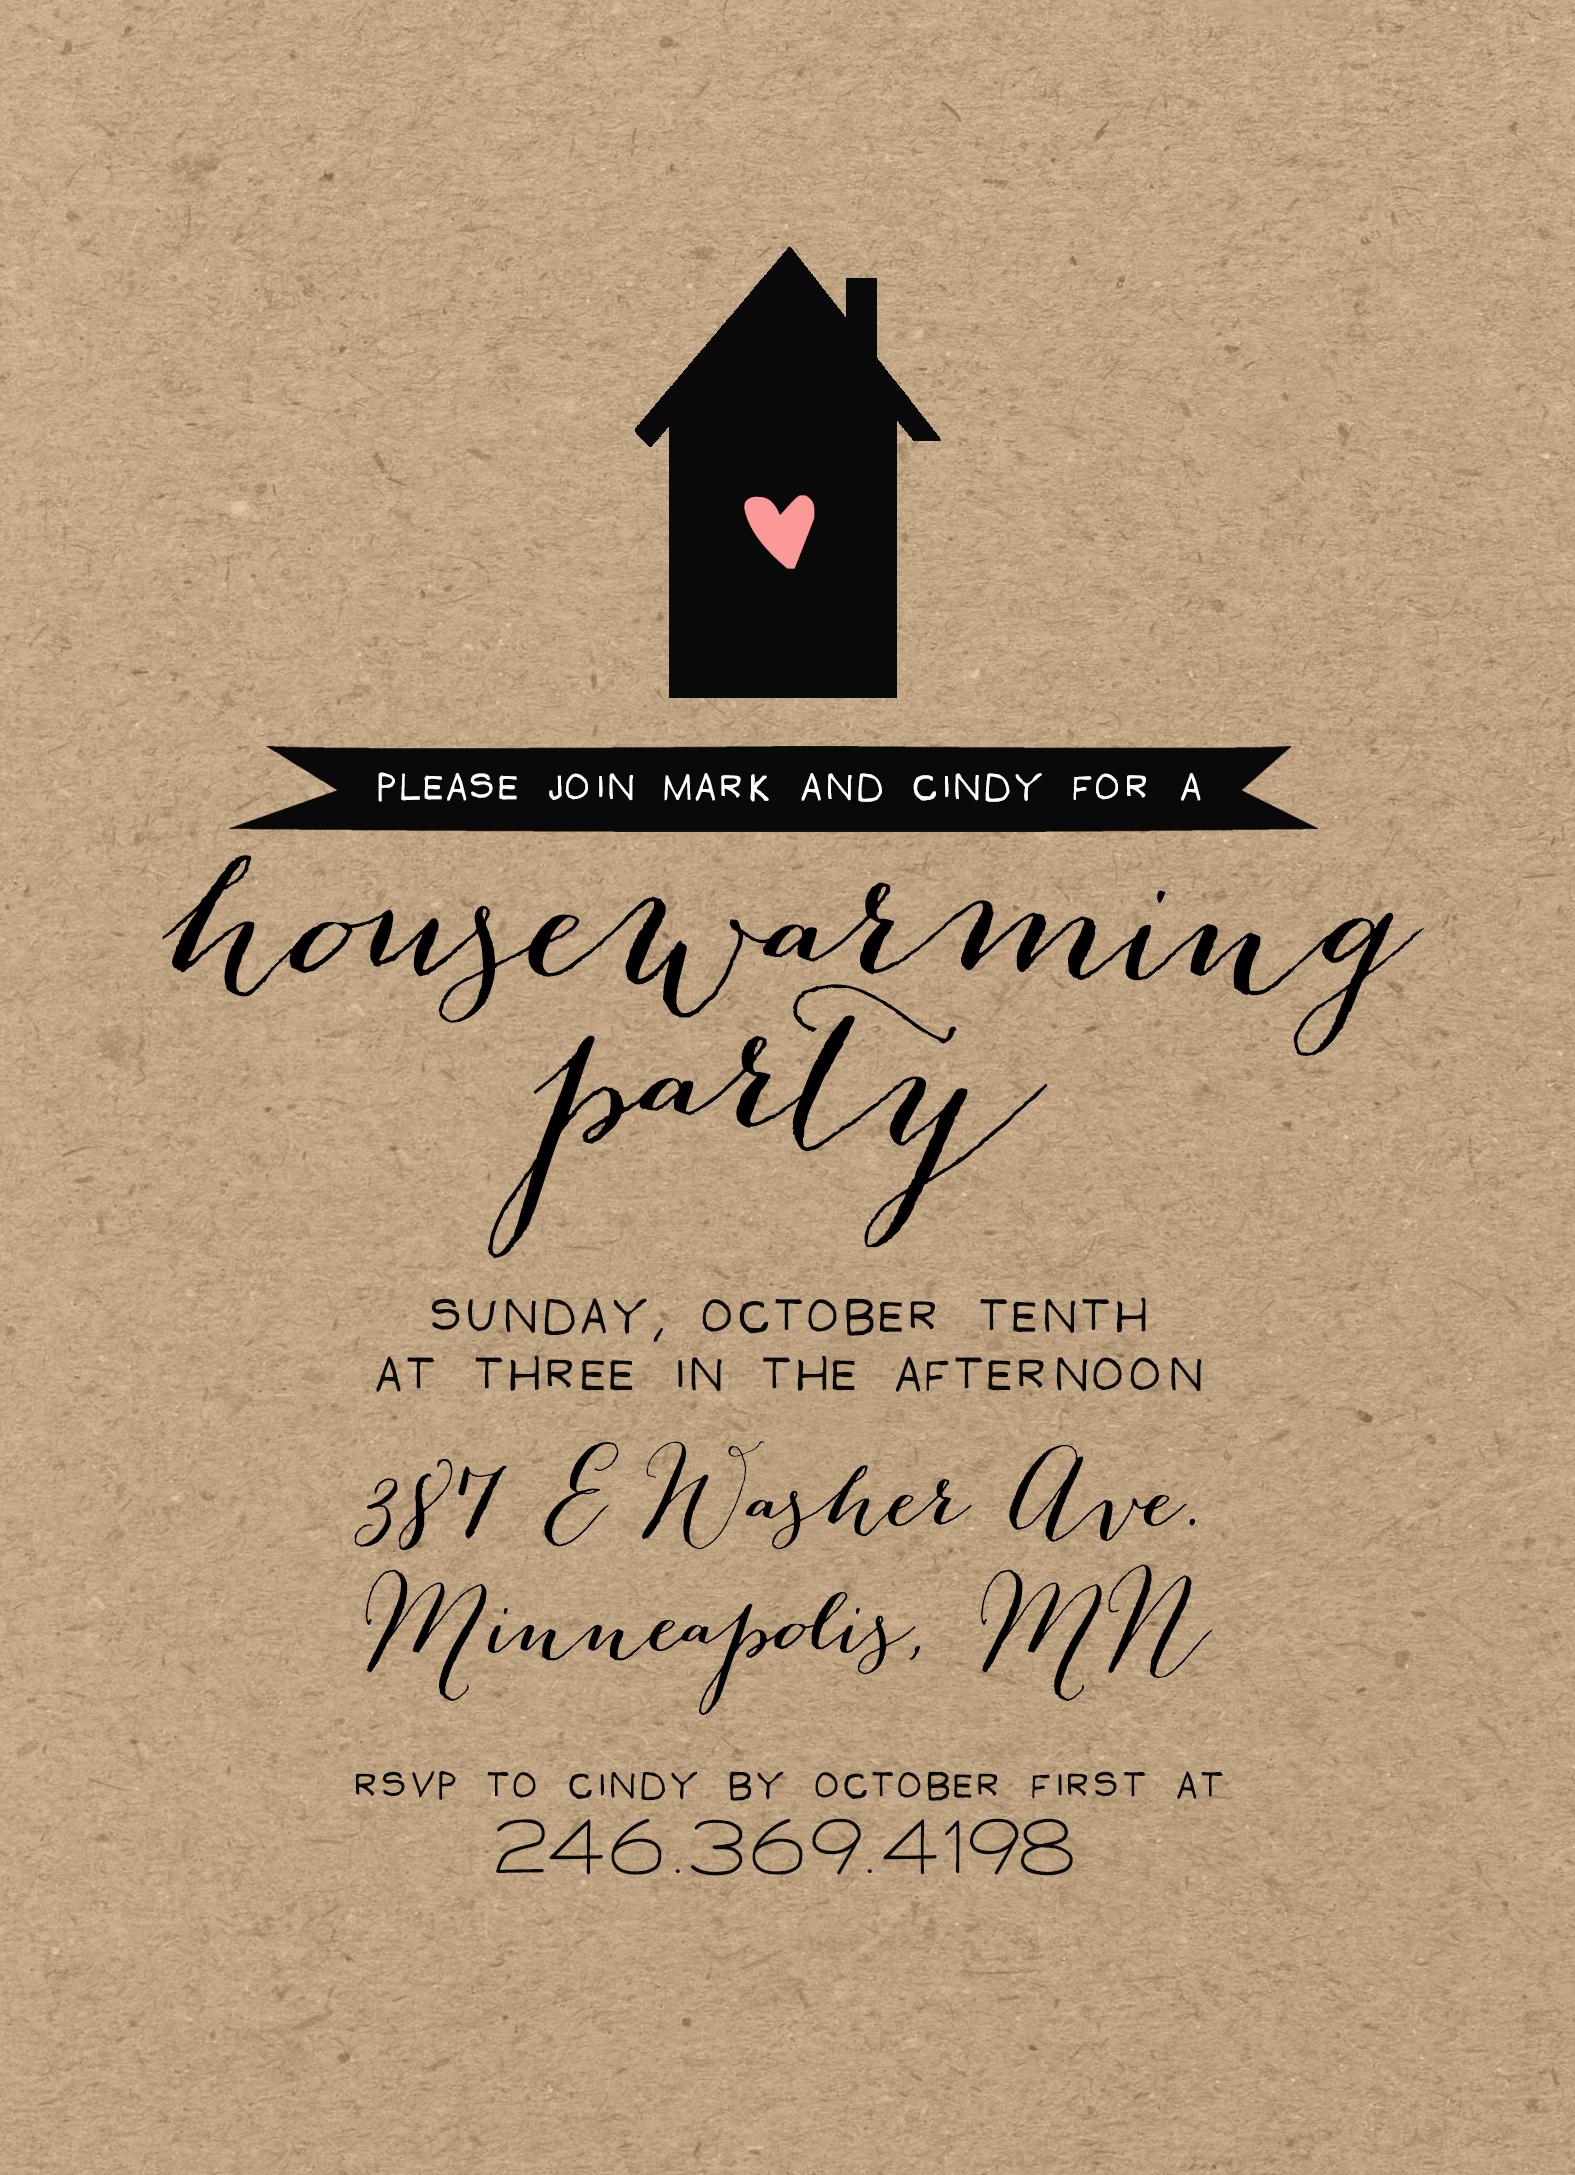 House Blessing Invitation Wording Elegant Kraft Housewarming Party Invitation Rustic Shabby Chic